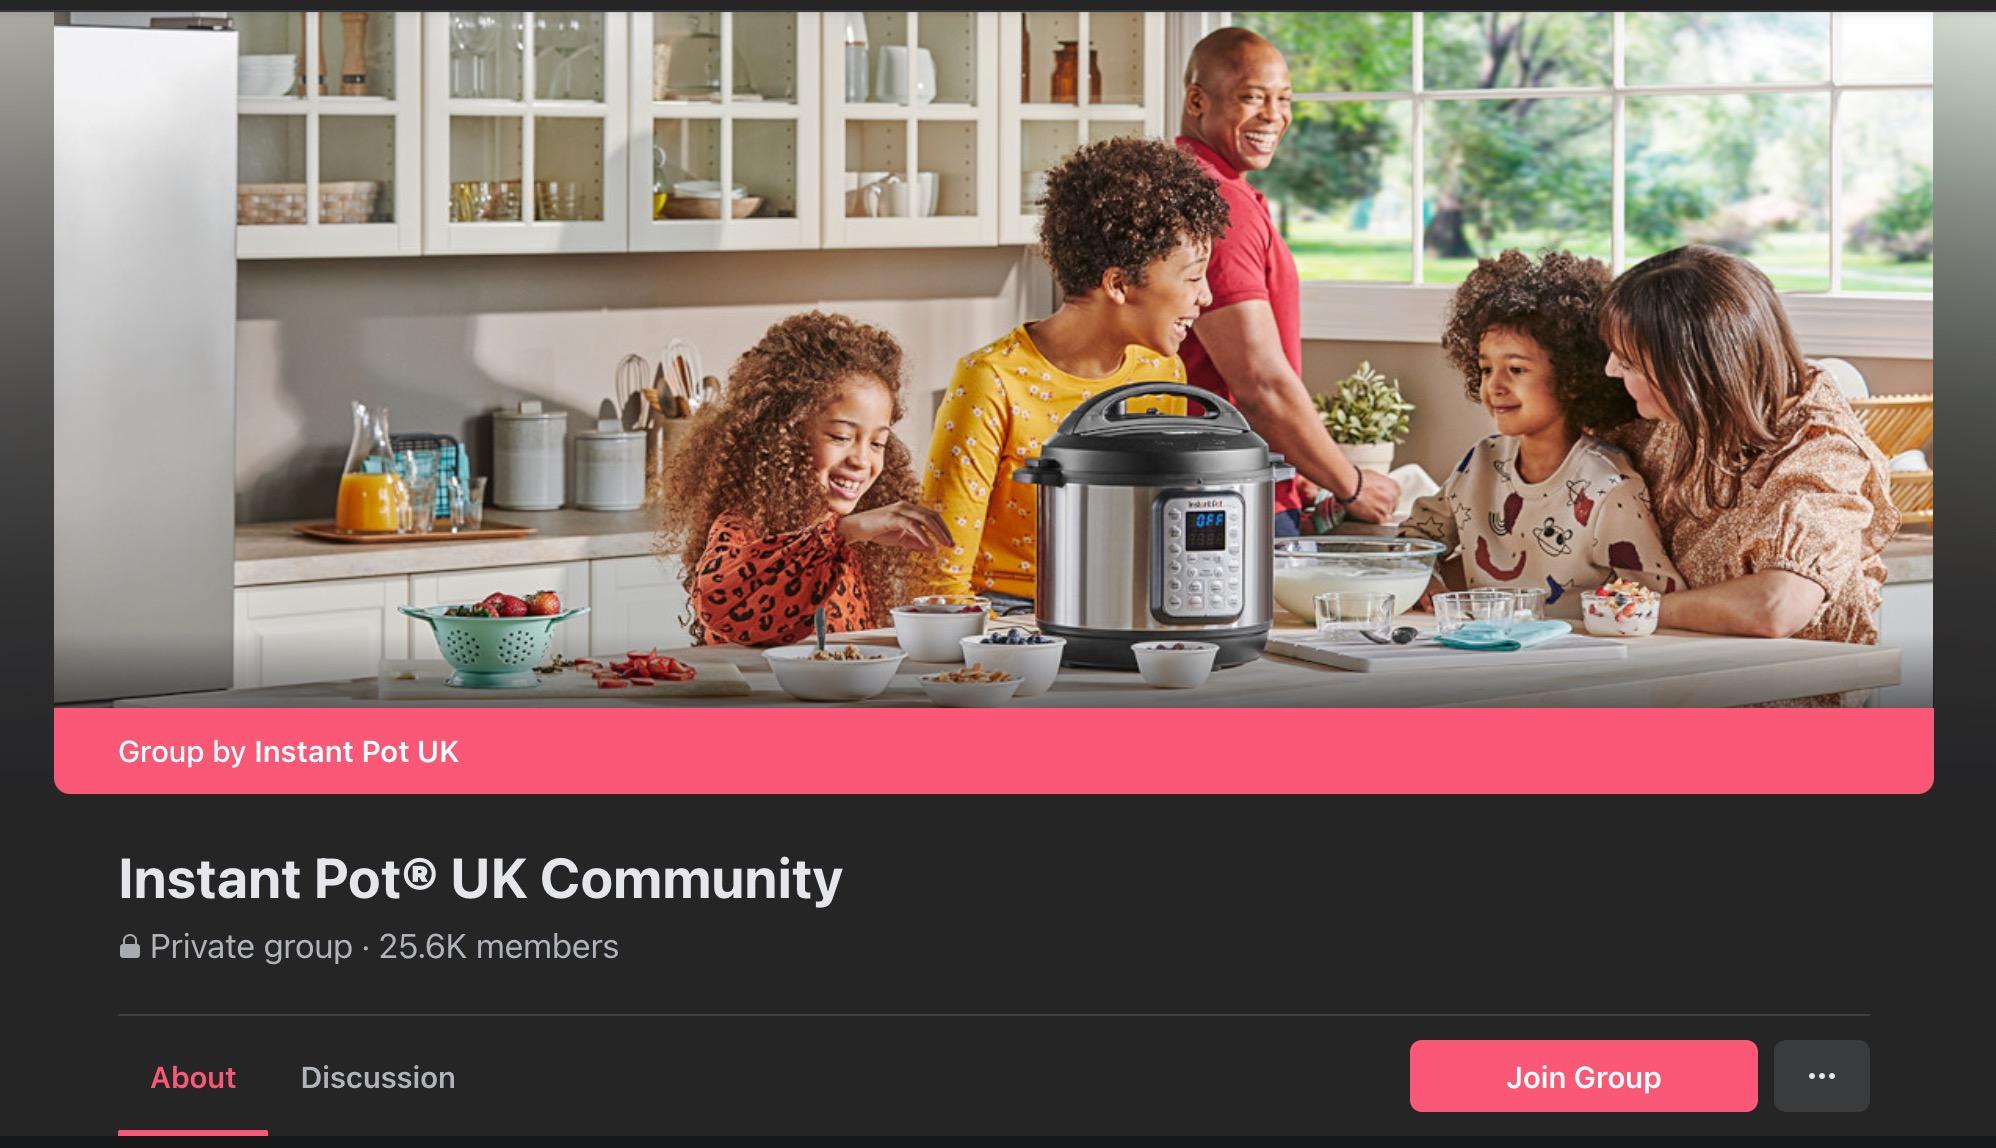 Instant Pot UK Community Facebook Group Page